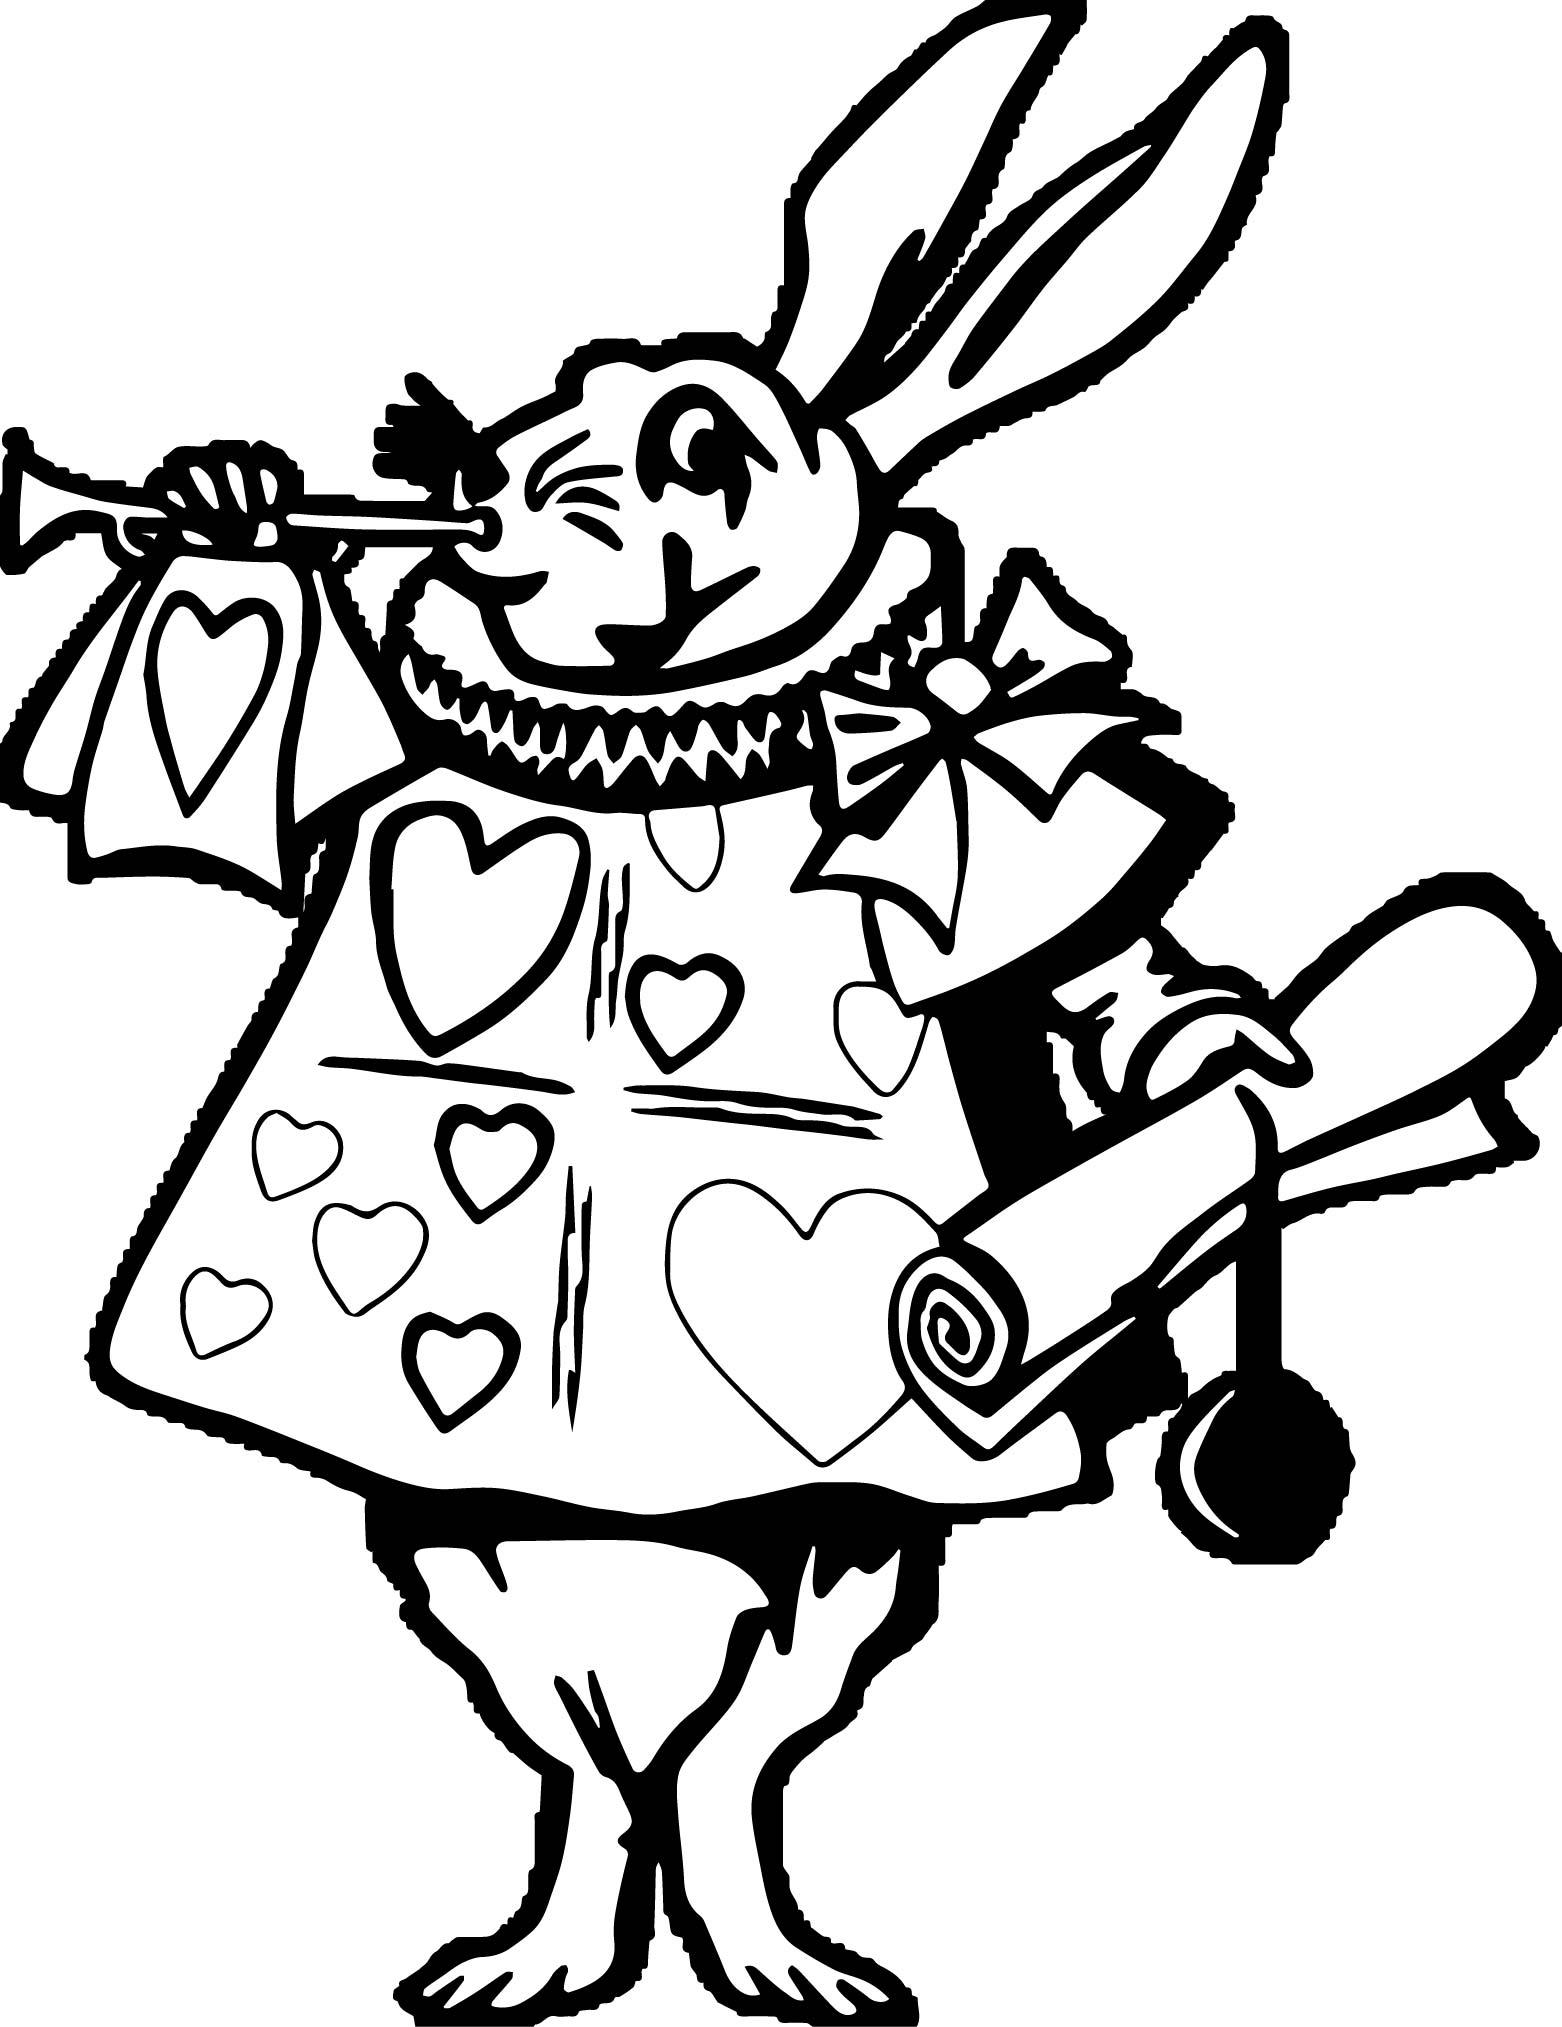 Alice In The Wonderland Envoy Bunny Coloring Page